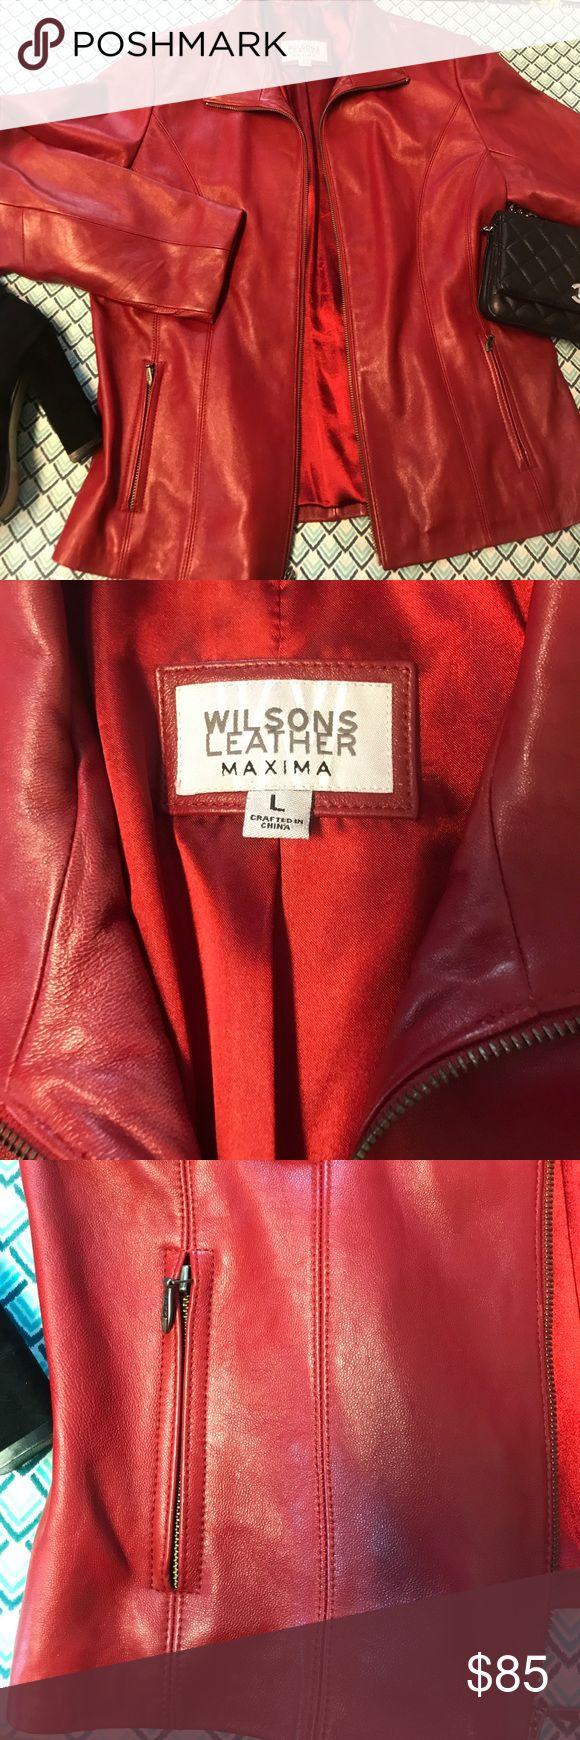 WILSON'S 100 LEATHER Maxima jacket Wilsons leather